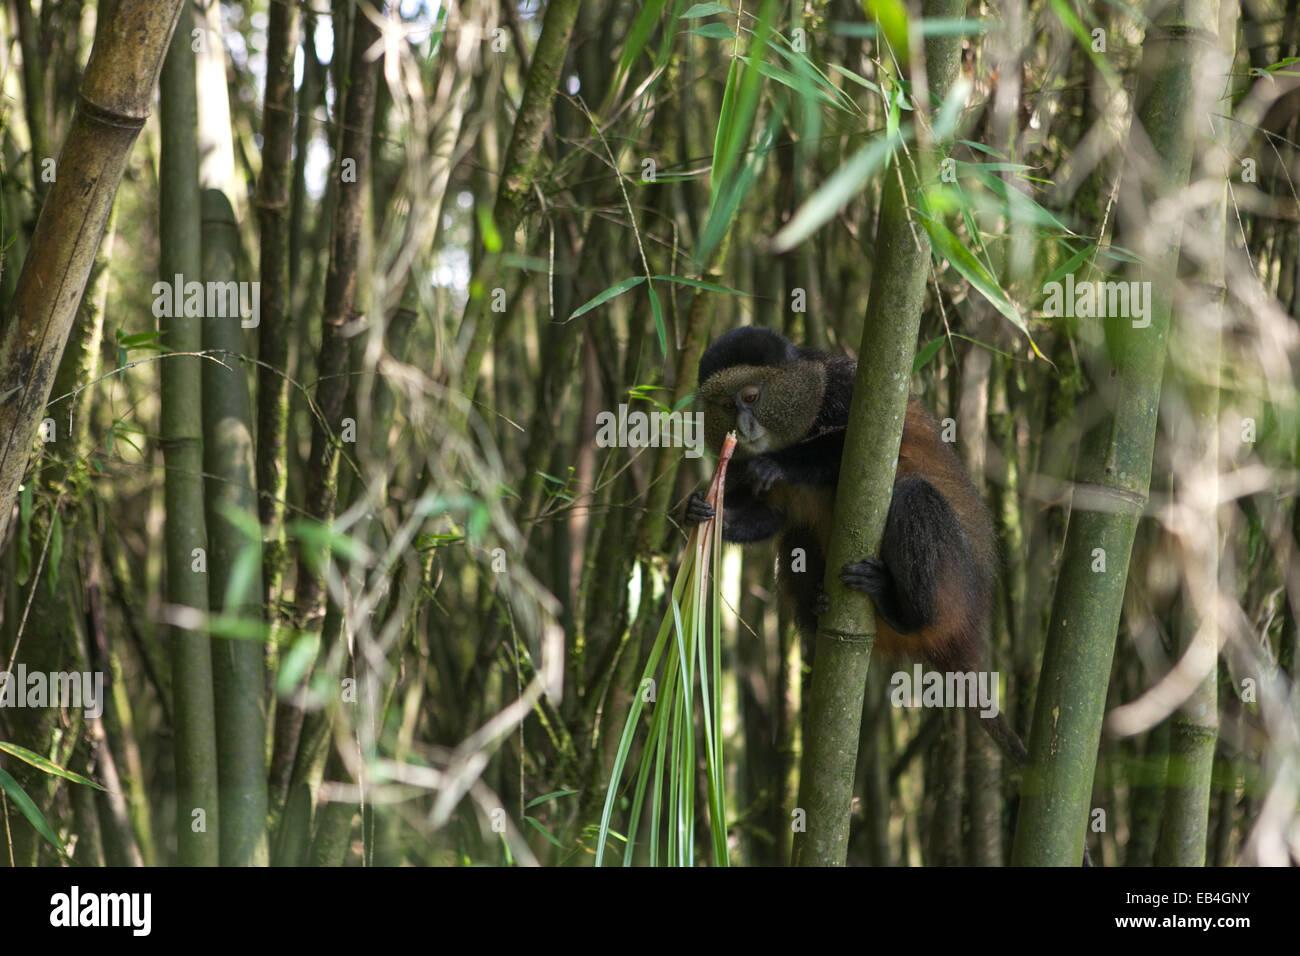 A golden monkey, Cercopithecus kandti, grips a bamboo shoot and eats vegetation. - Stock Image